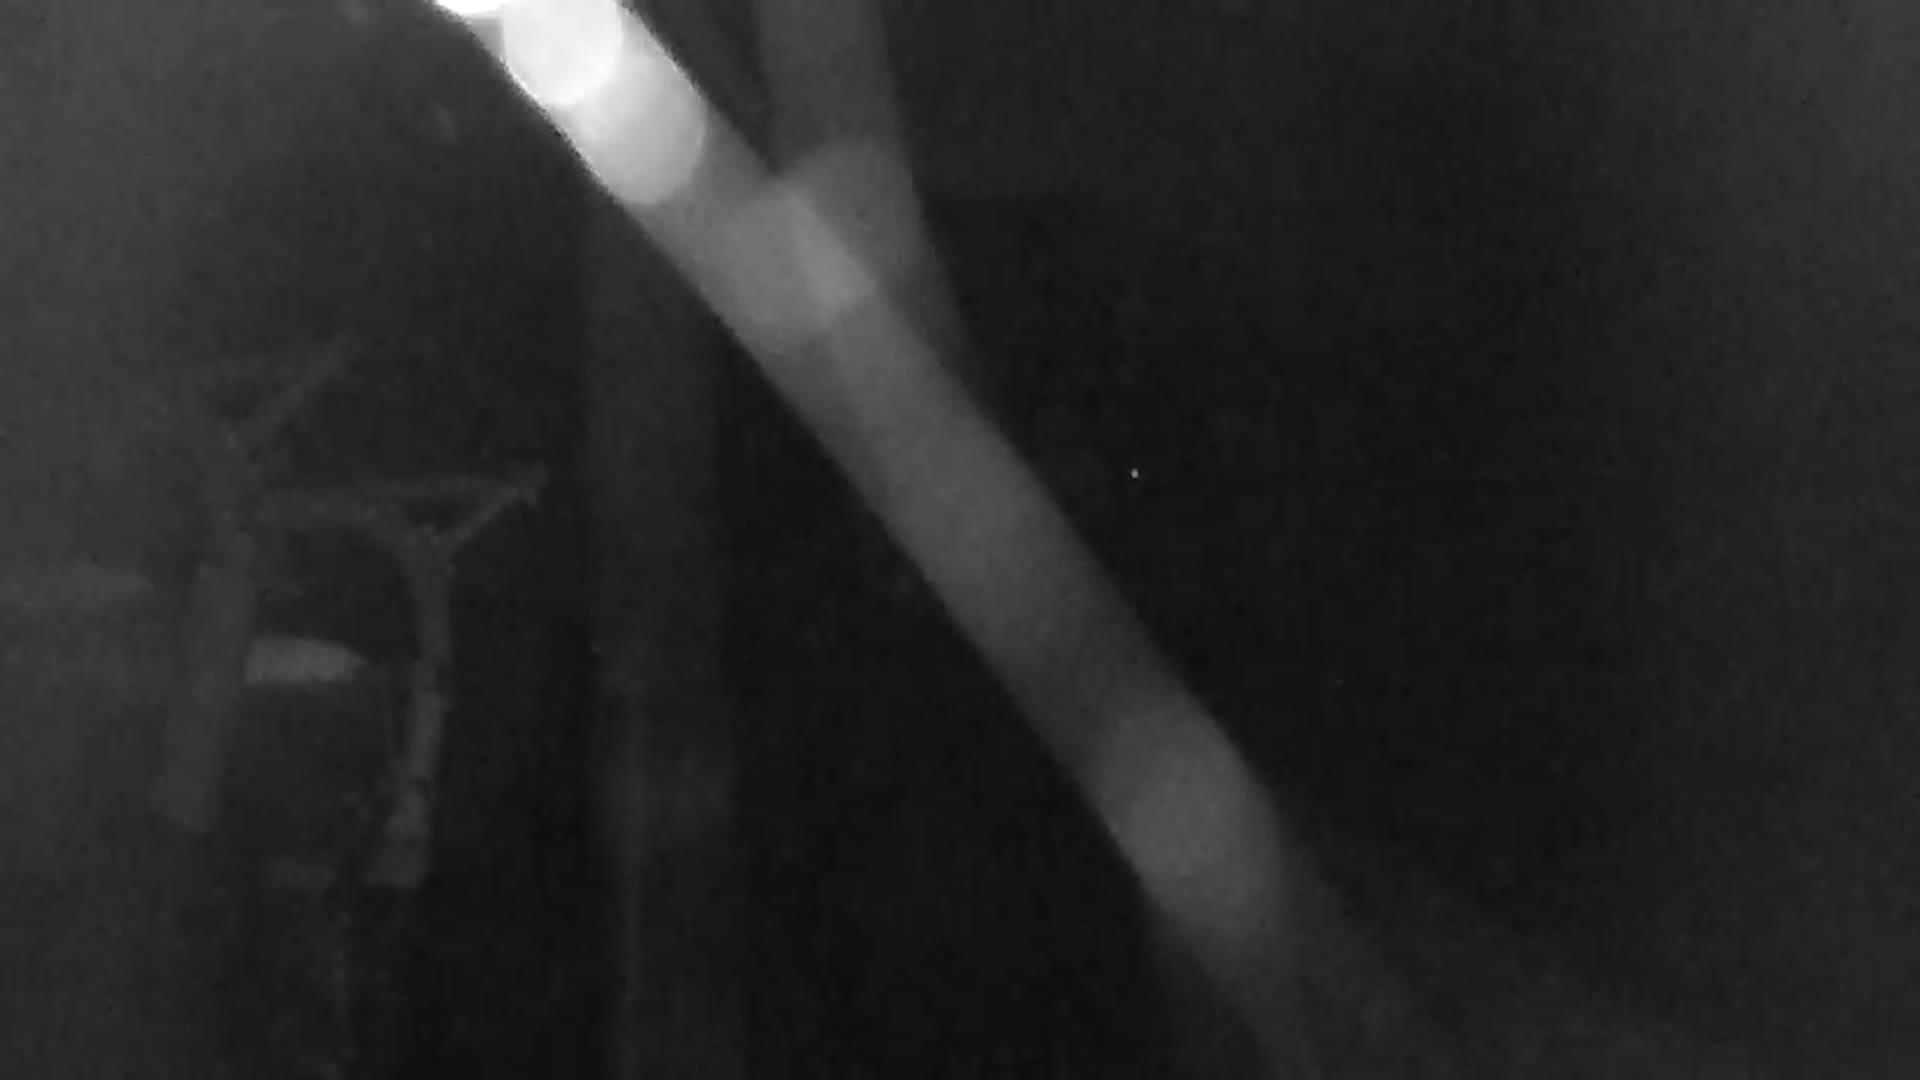 Webcam Skigebiet Czarna Gora cam 3 - Glatzer Schneegebirge